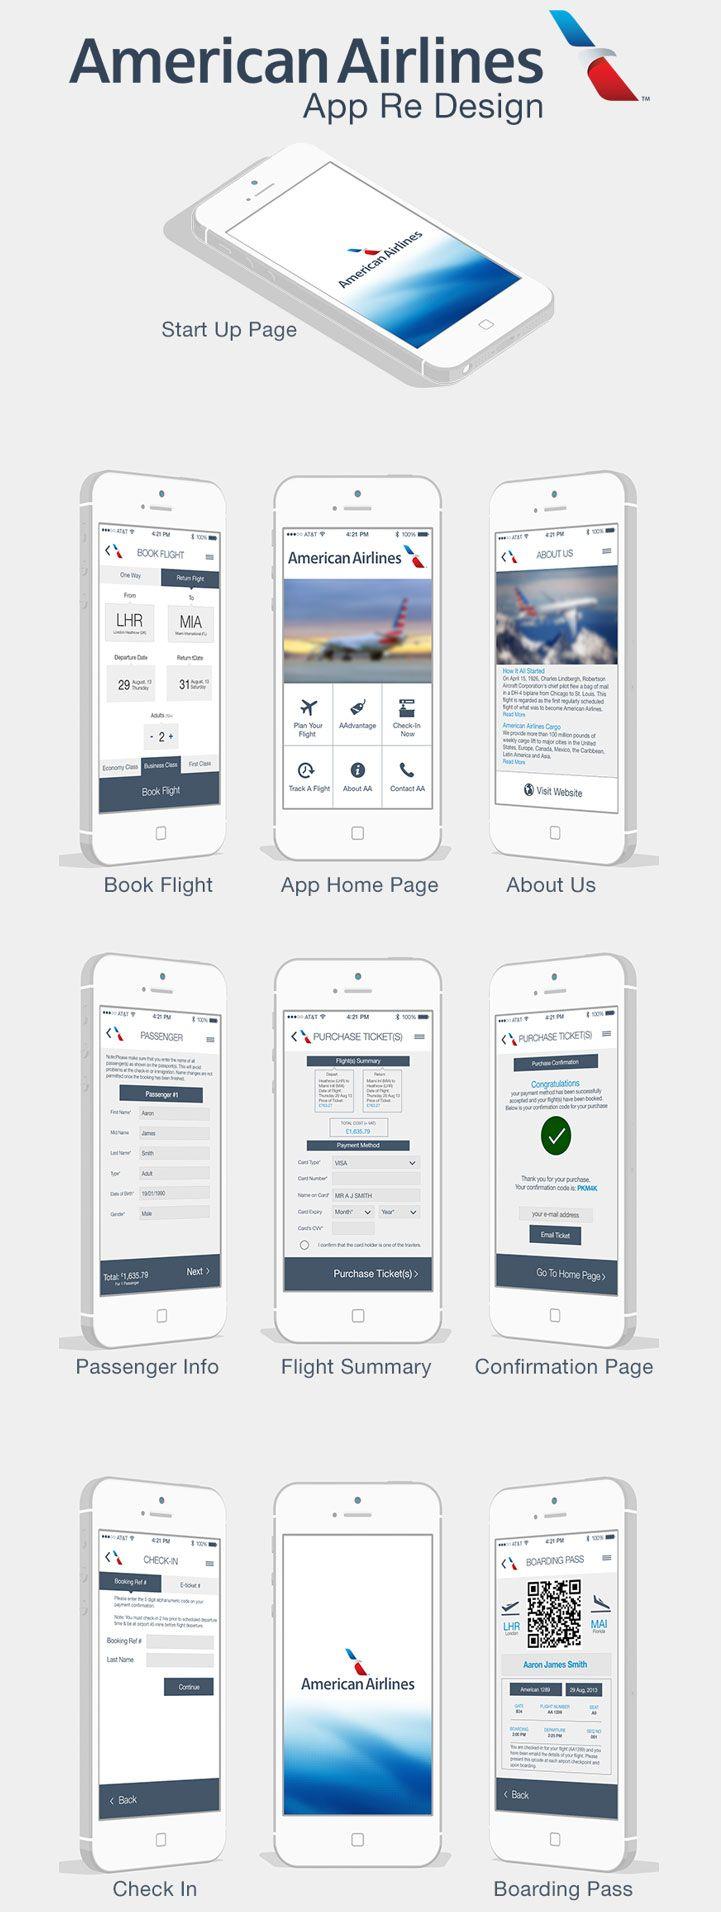 American Airlines App Re Design